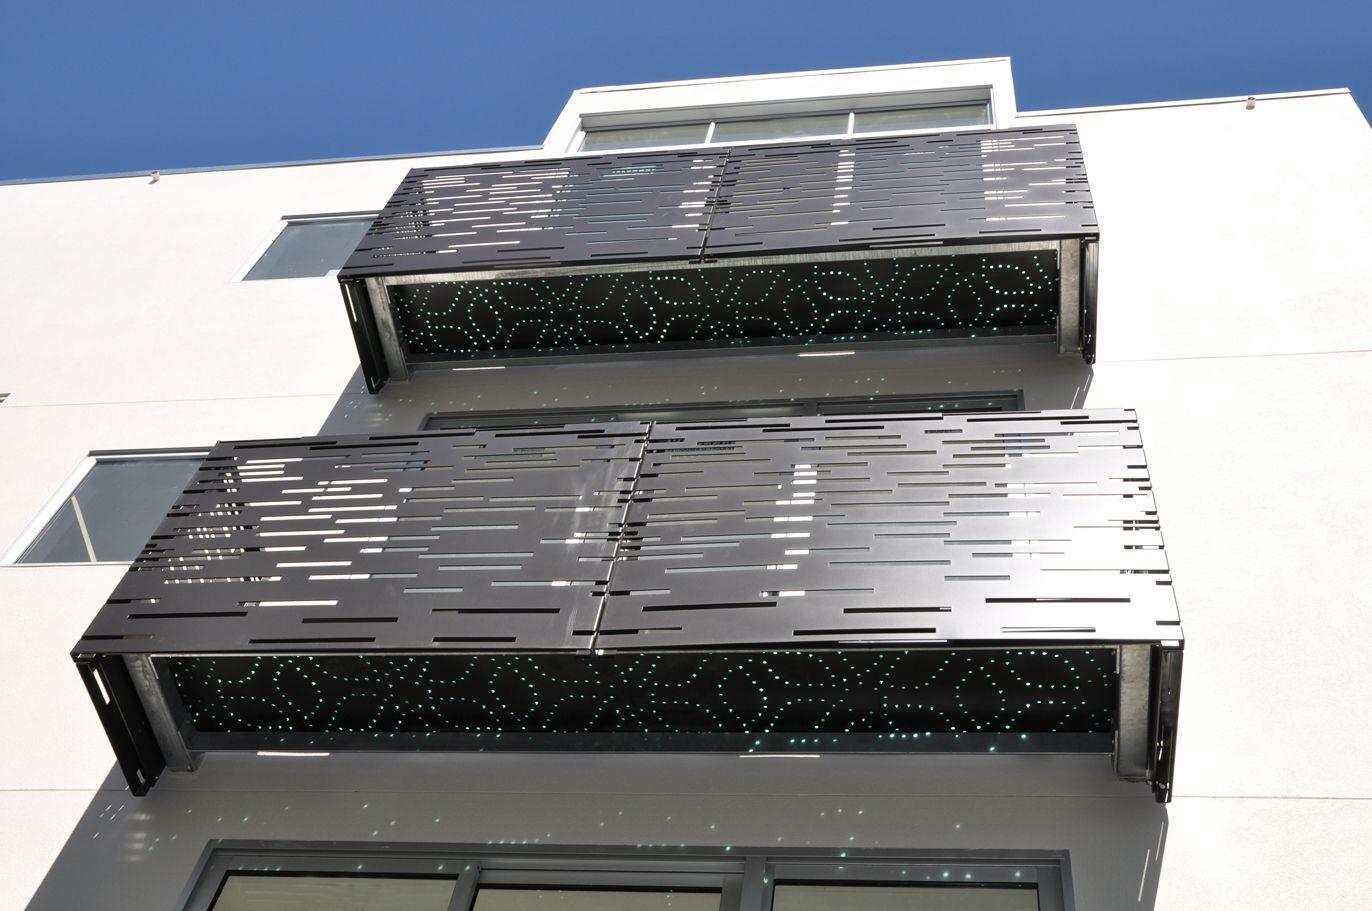 juliette balconies juliet balcony balconet balconette laser cut metal bokmodern bok modern. Black Bedroom Furniture Sets. Home Design Ideas